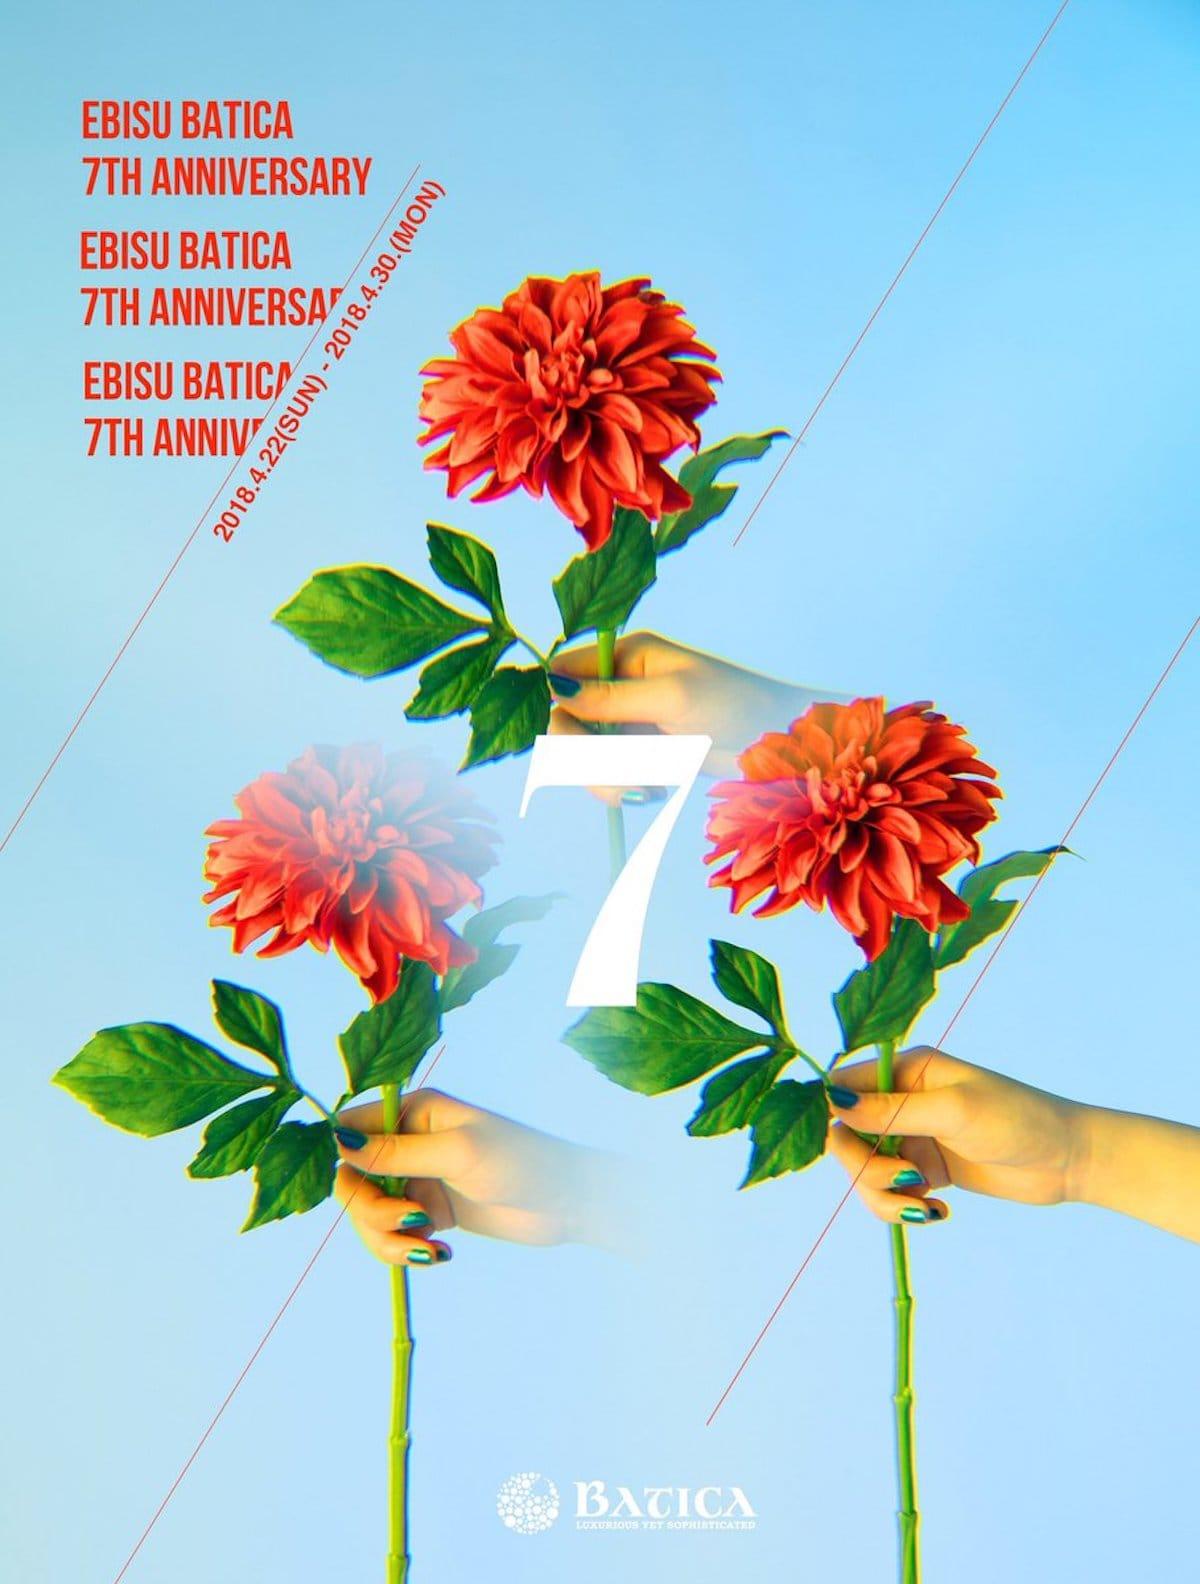 BATICA7周年祭に向井秀徳やCreativeDrugStore、マザーファッ子、DJ Megu(Negicco)らが登場。 music180409_batica_1-1-1200x1584